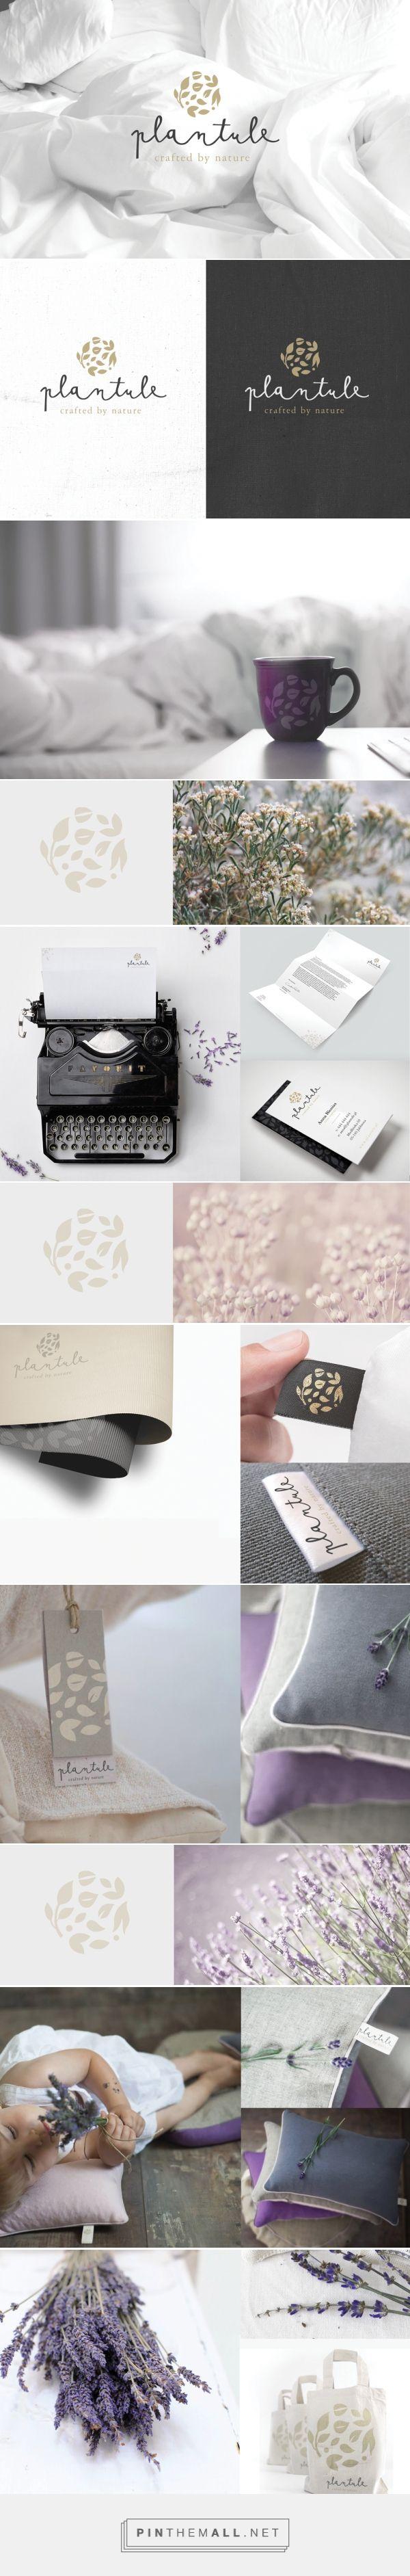 Plantule :: Corporate identity and branding - created via https://pinthemall.net